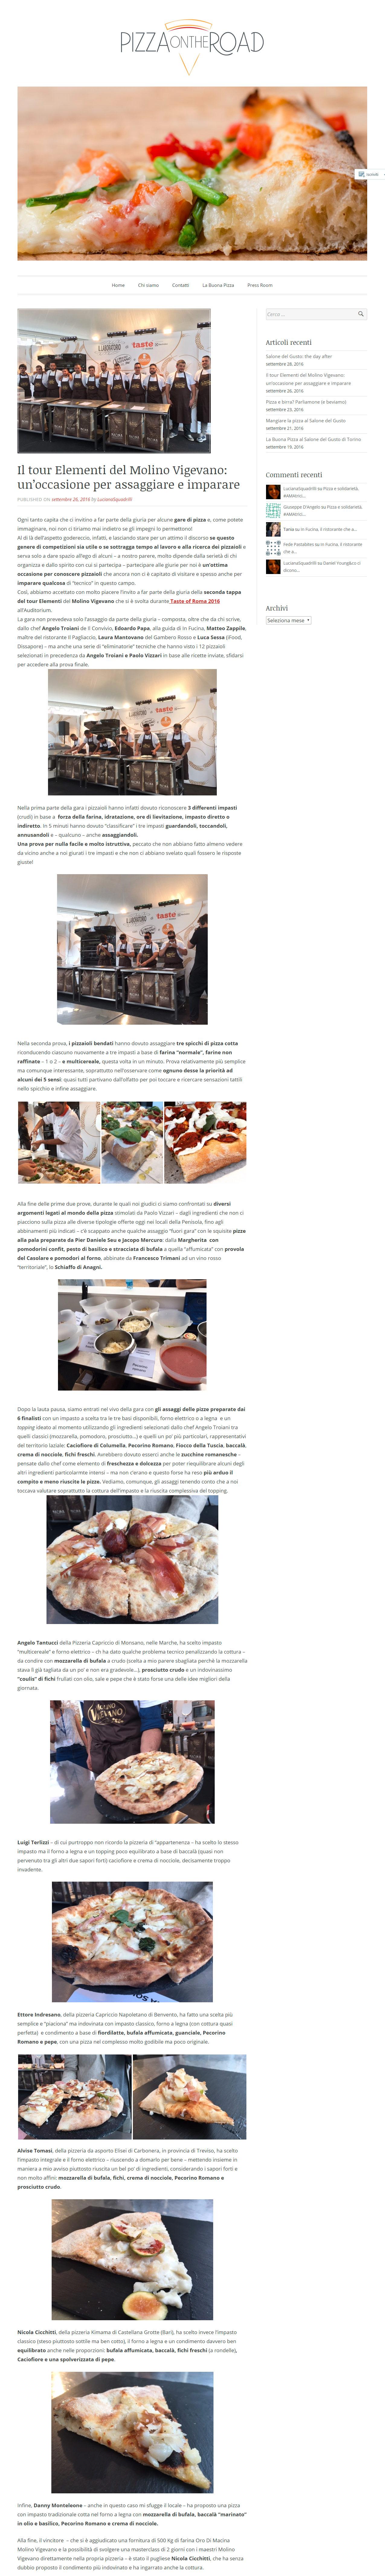 26-09-2016_pizzaontheroad-eu